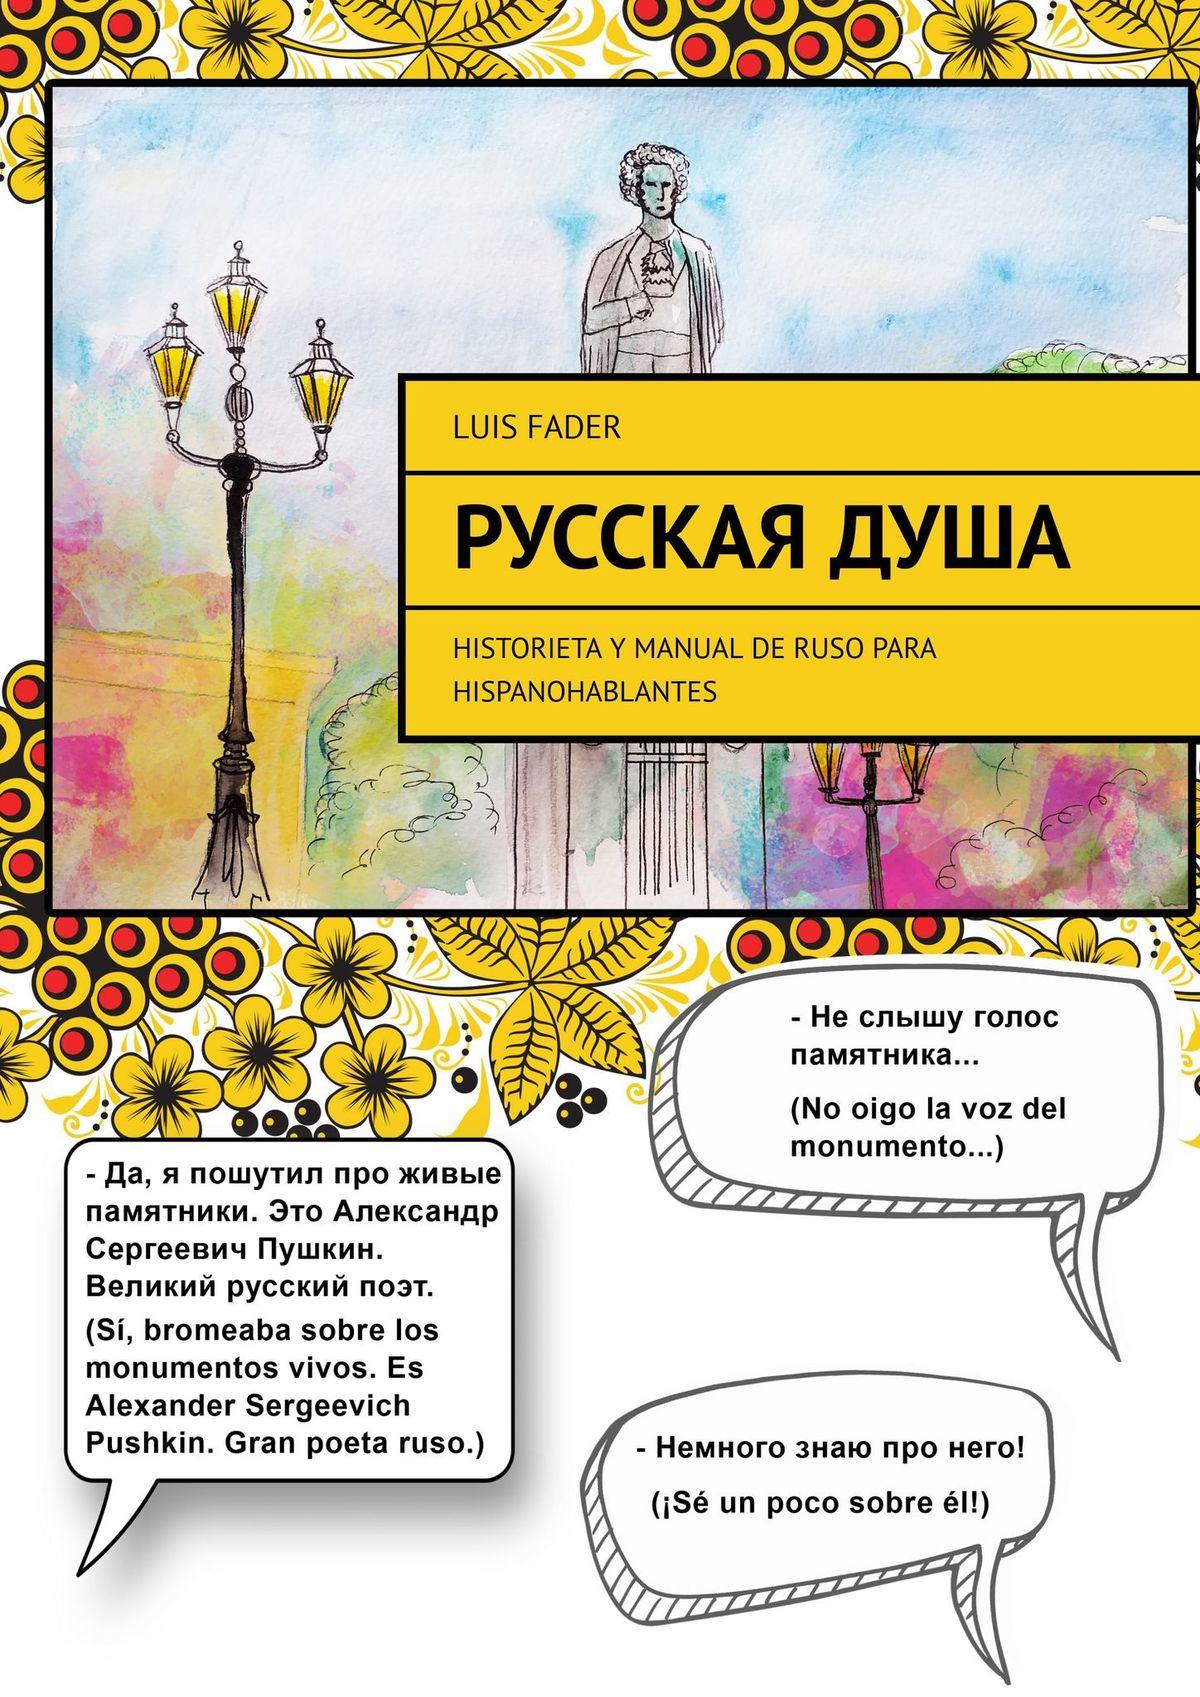 Luis Fader Русскаядуша. Historieta y manual de ruso para hispanohablantes цена в Москве и Питере